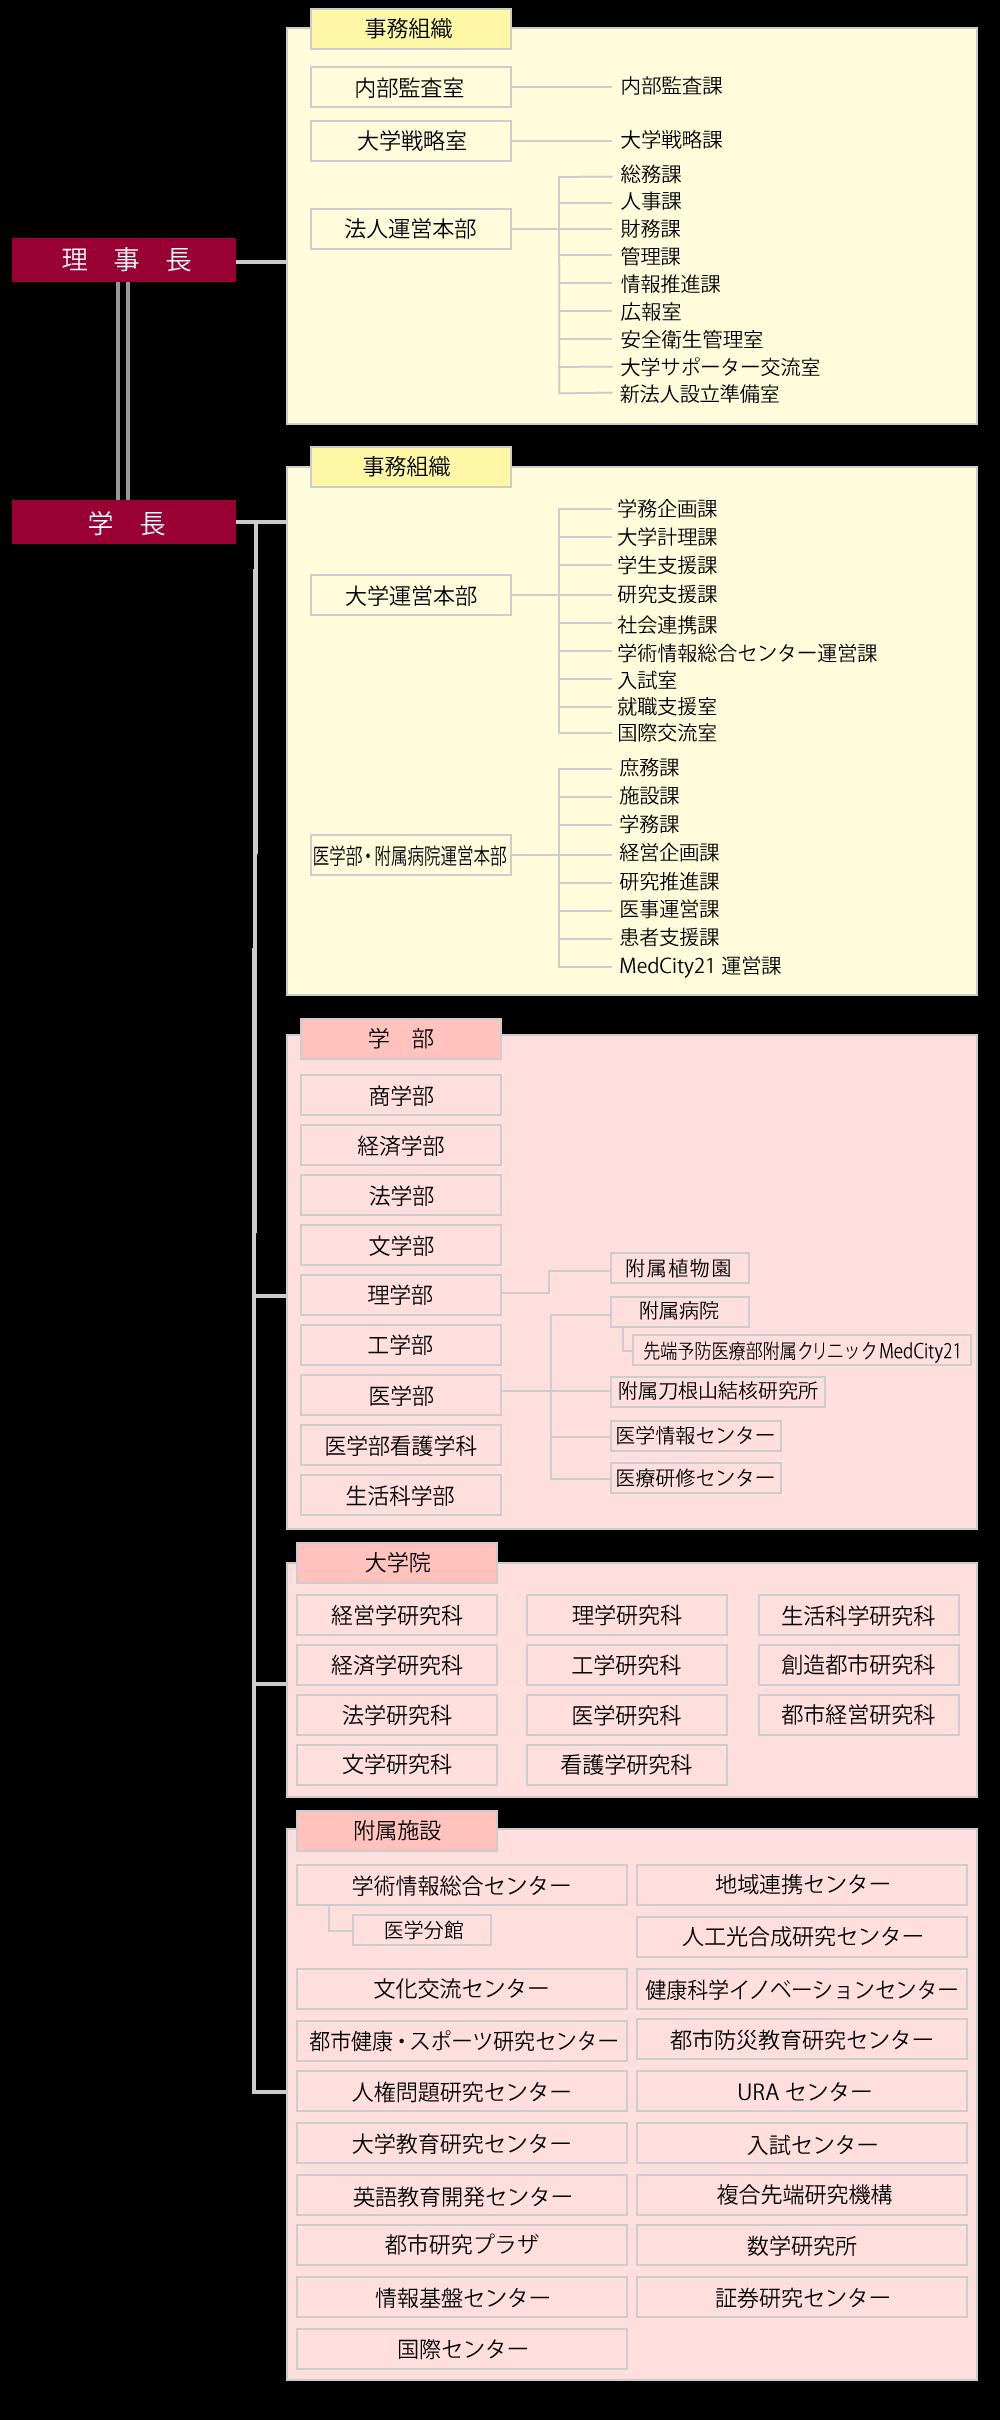 2018-4-1_組織図.png